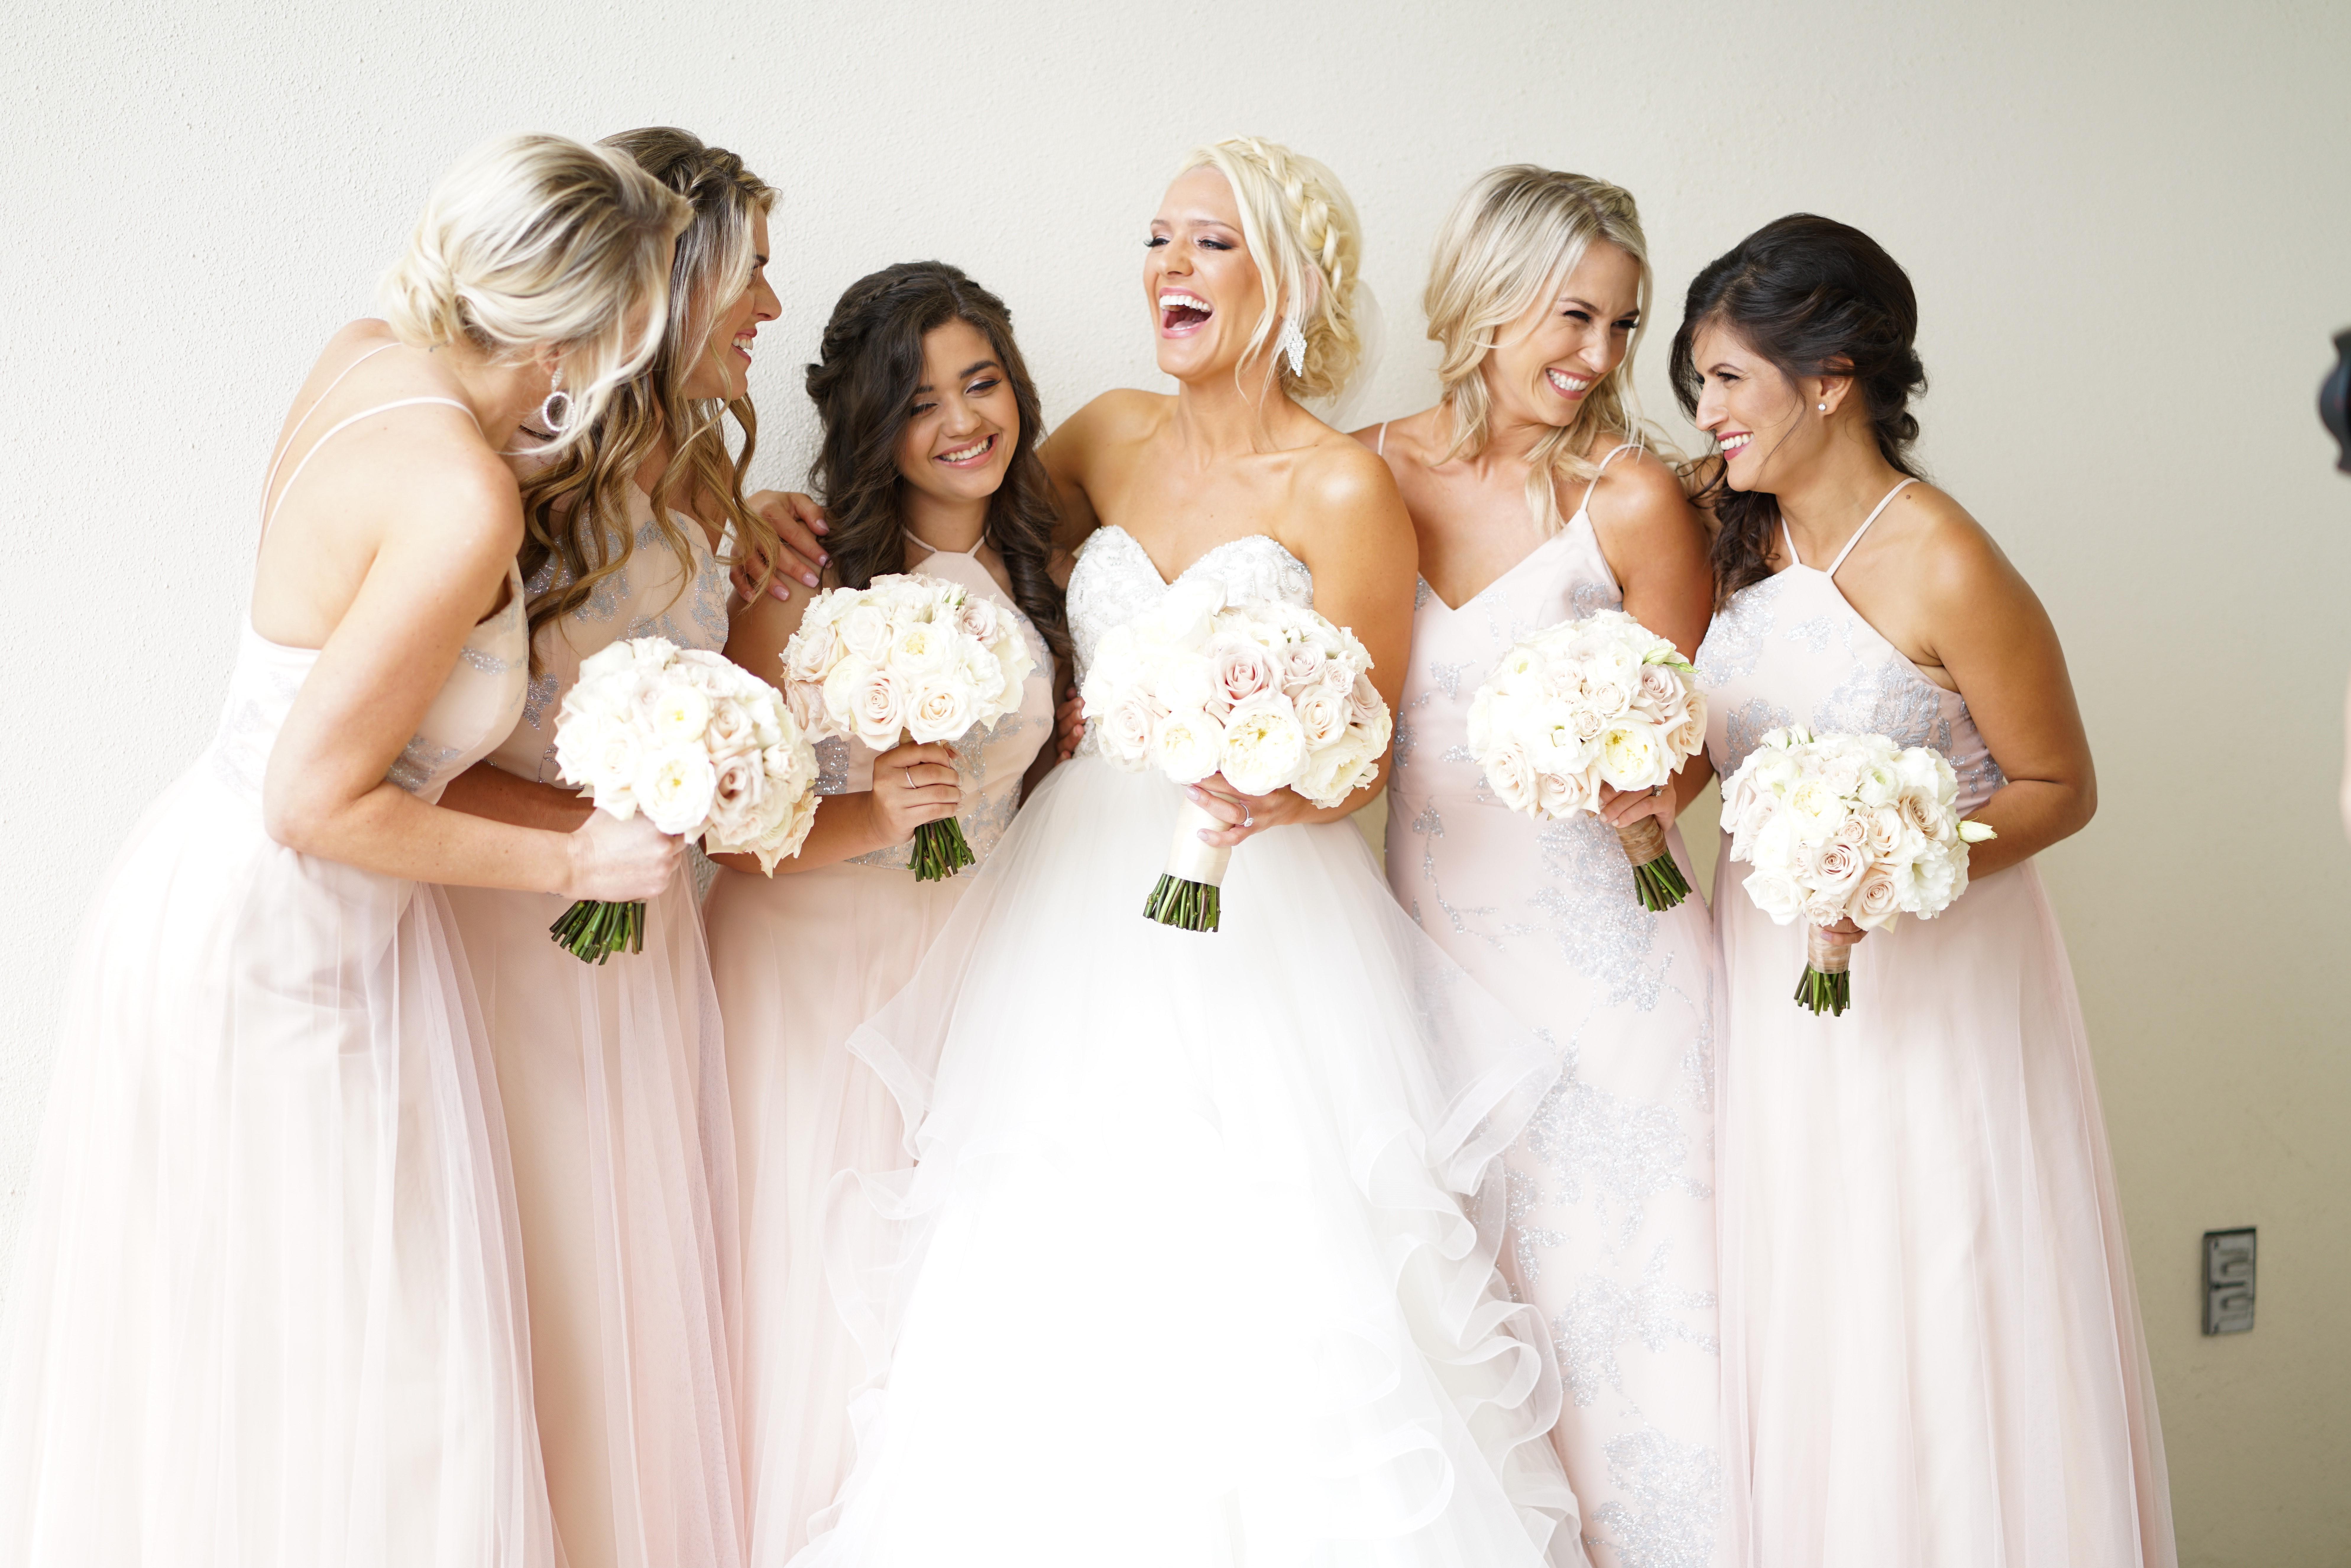 pink bride's maids dresses